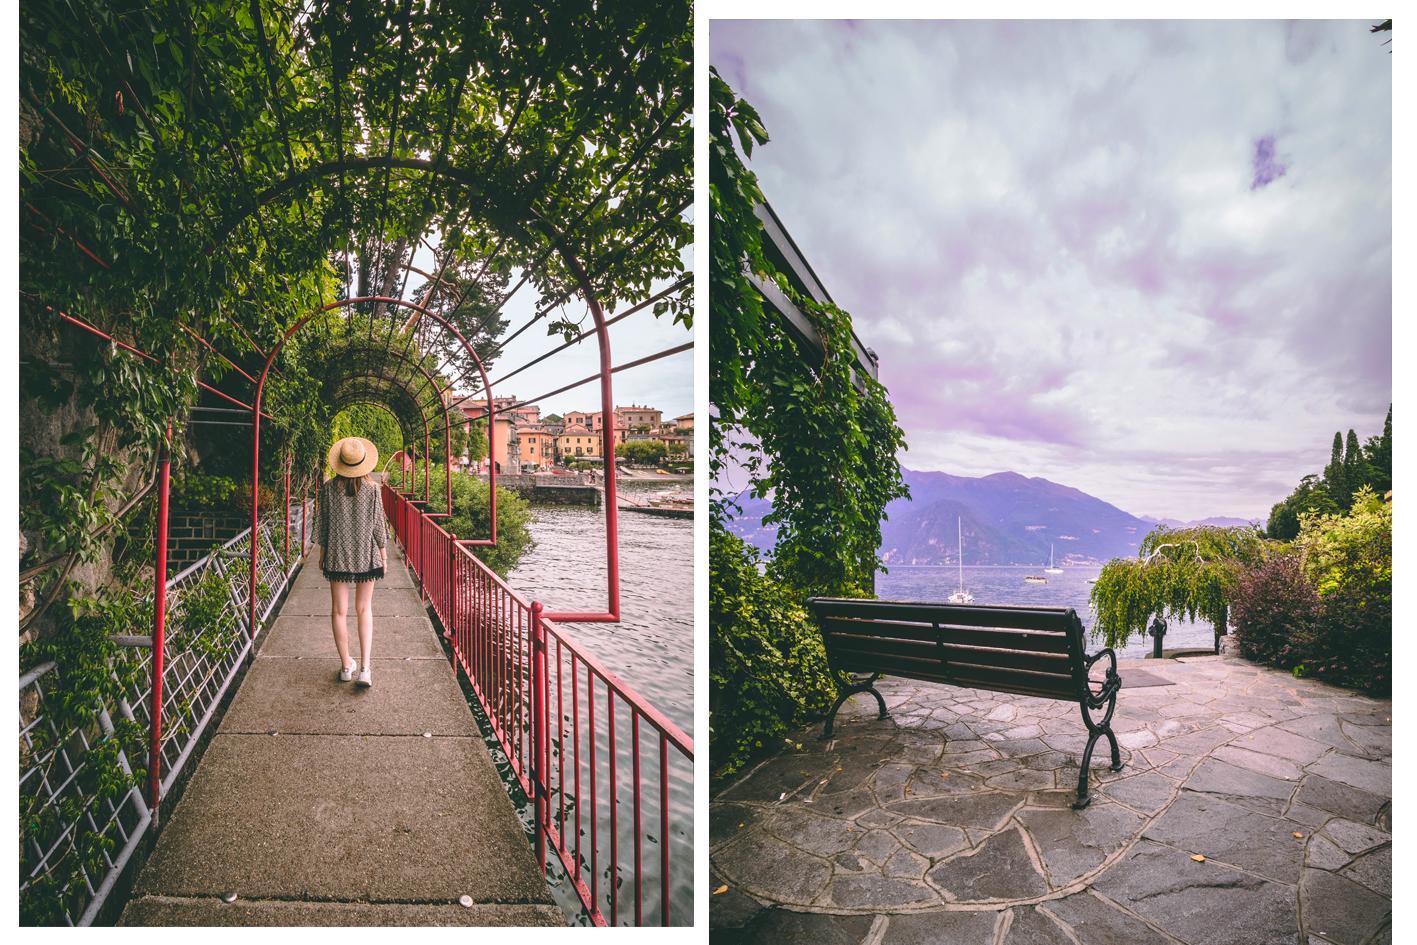 visiter Varenna lac de come